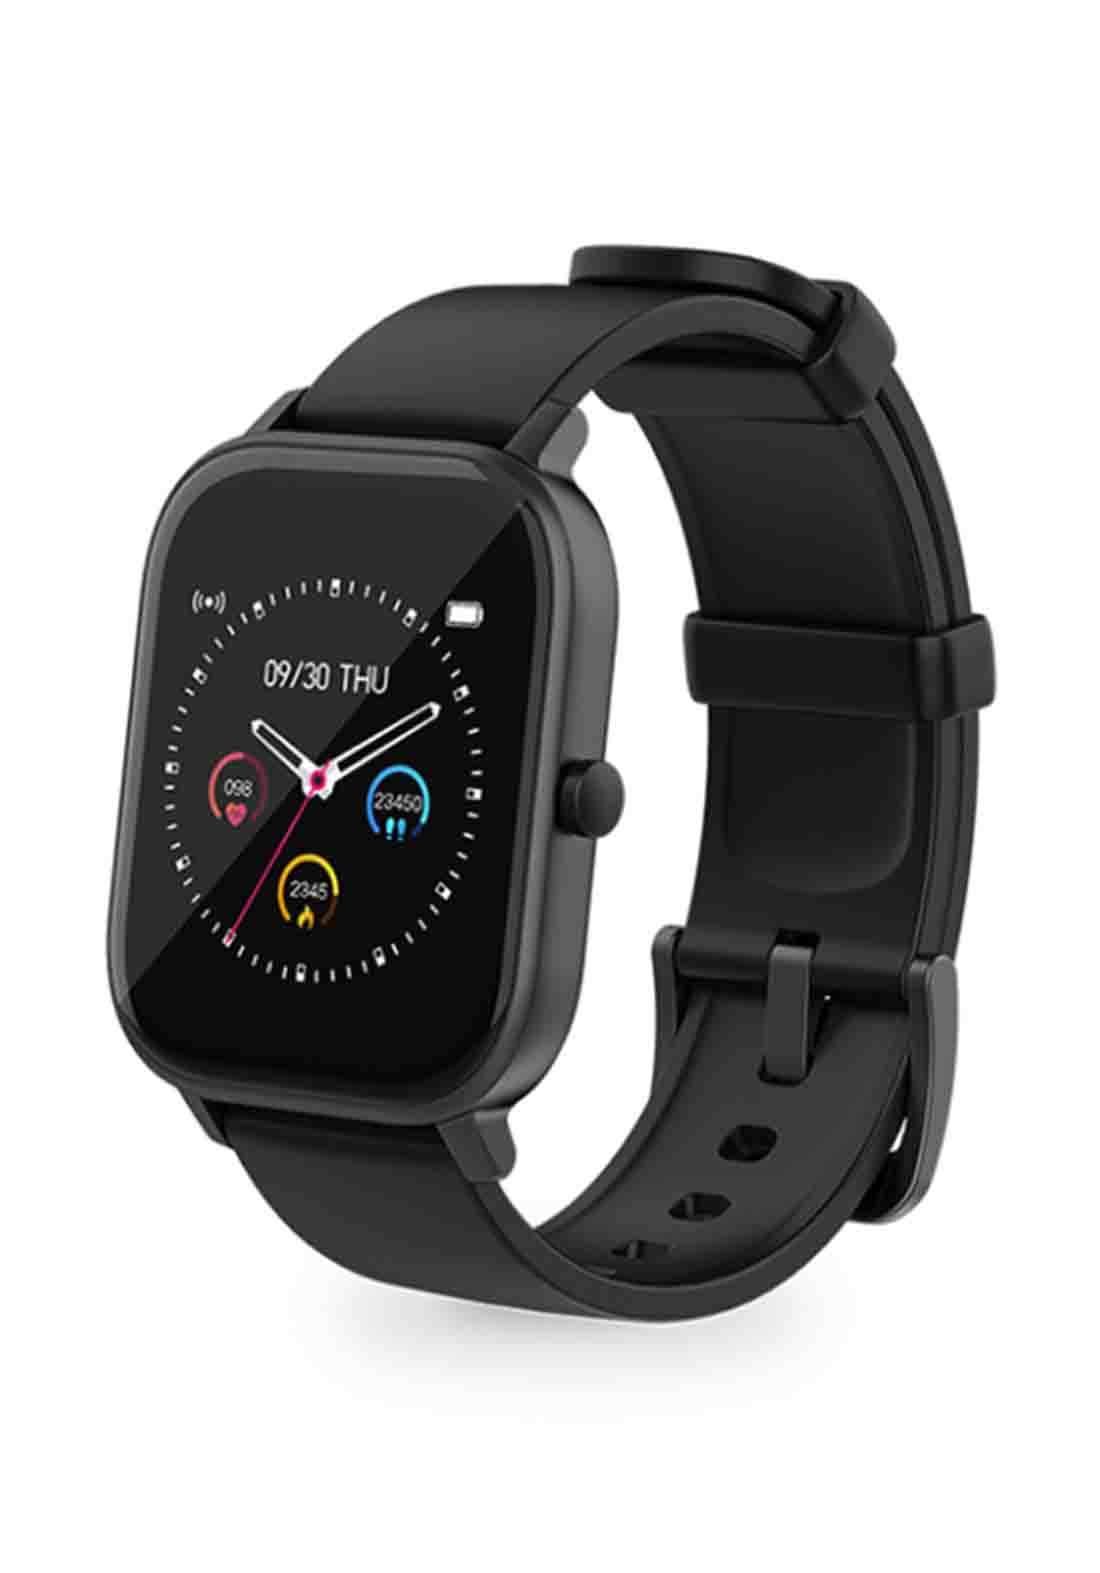 Havit M9006 Smart Bracelet - Black  ساعة ذكية